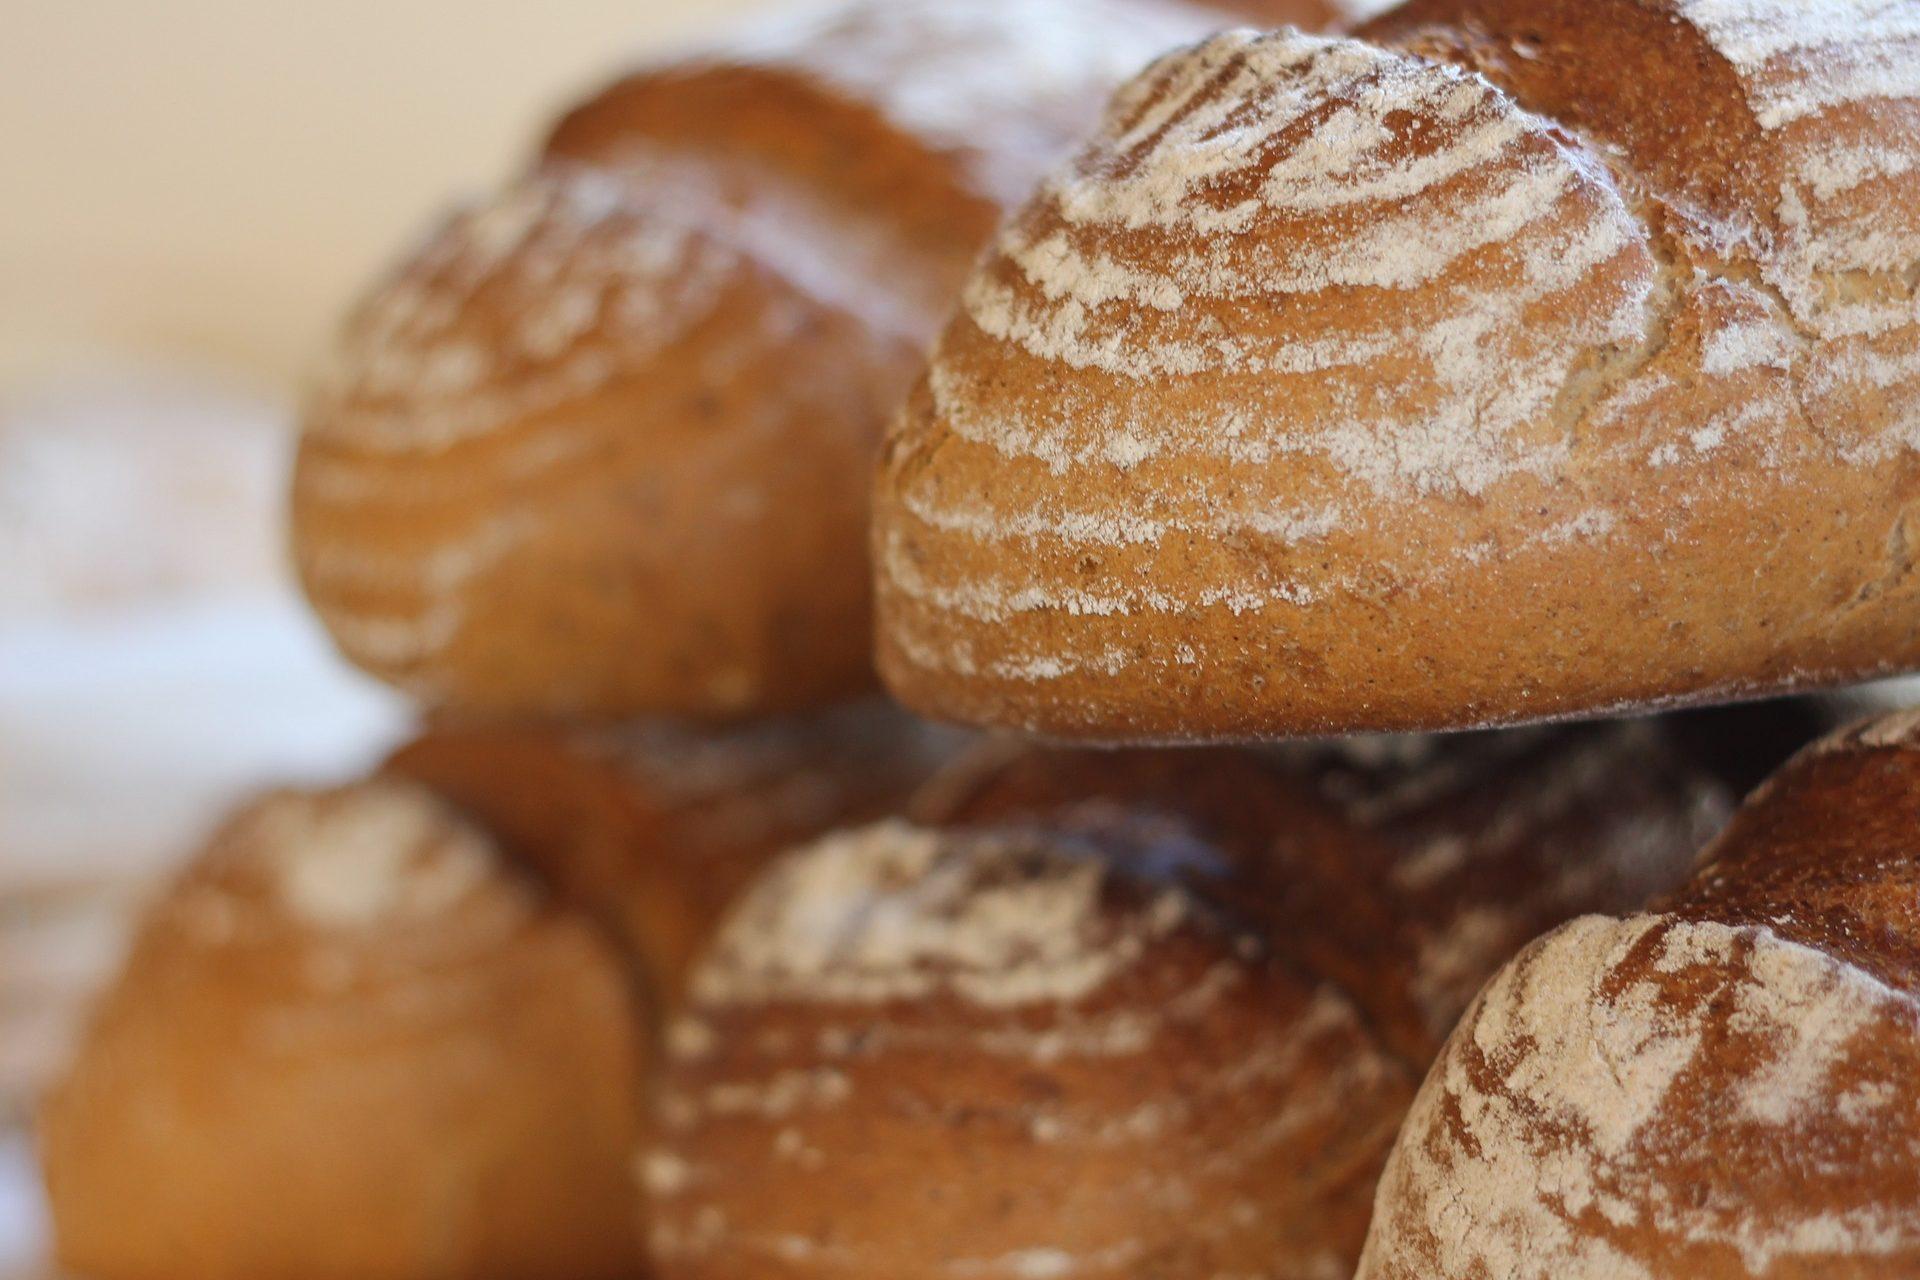 Enjoy fresh rolls from Lough's bakert